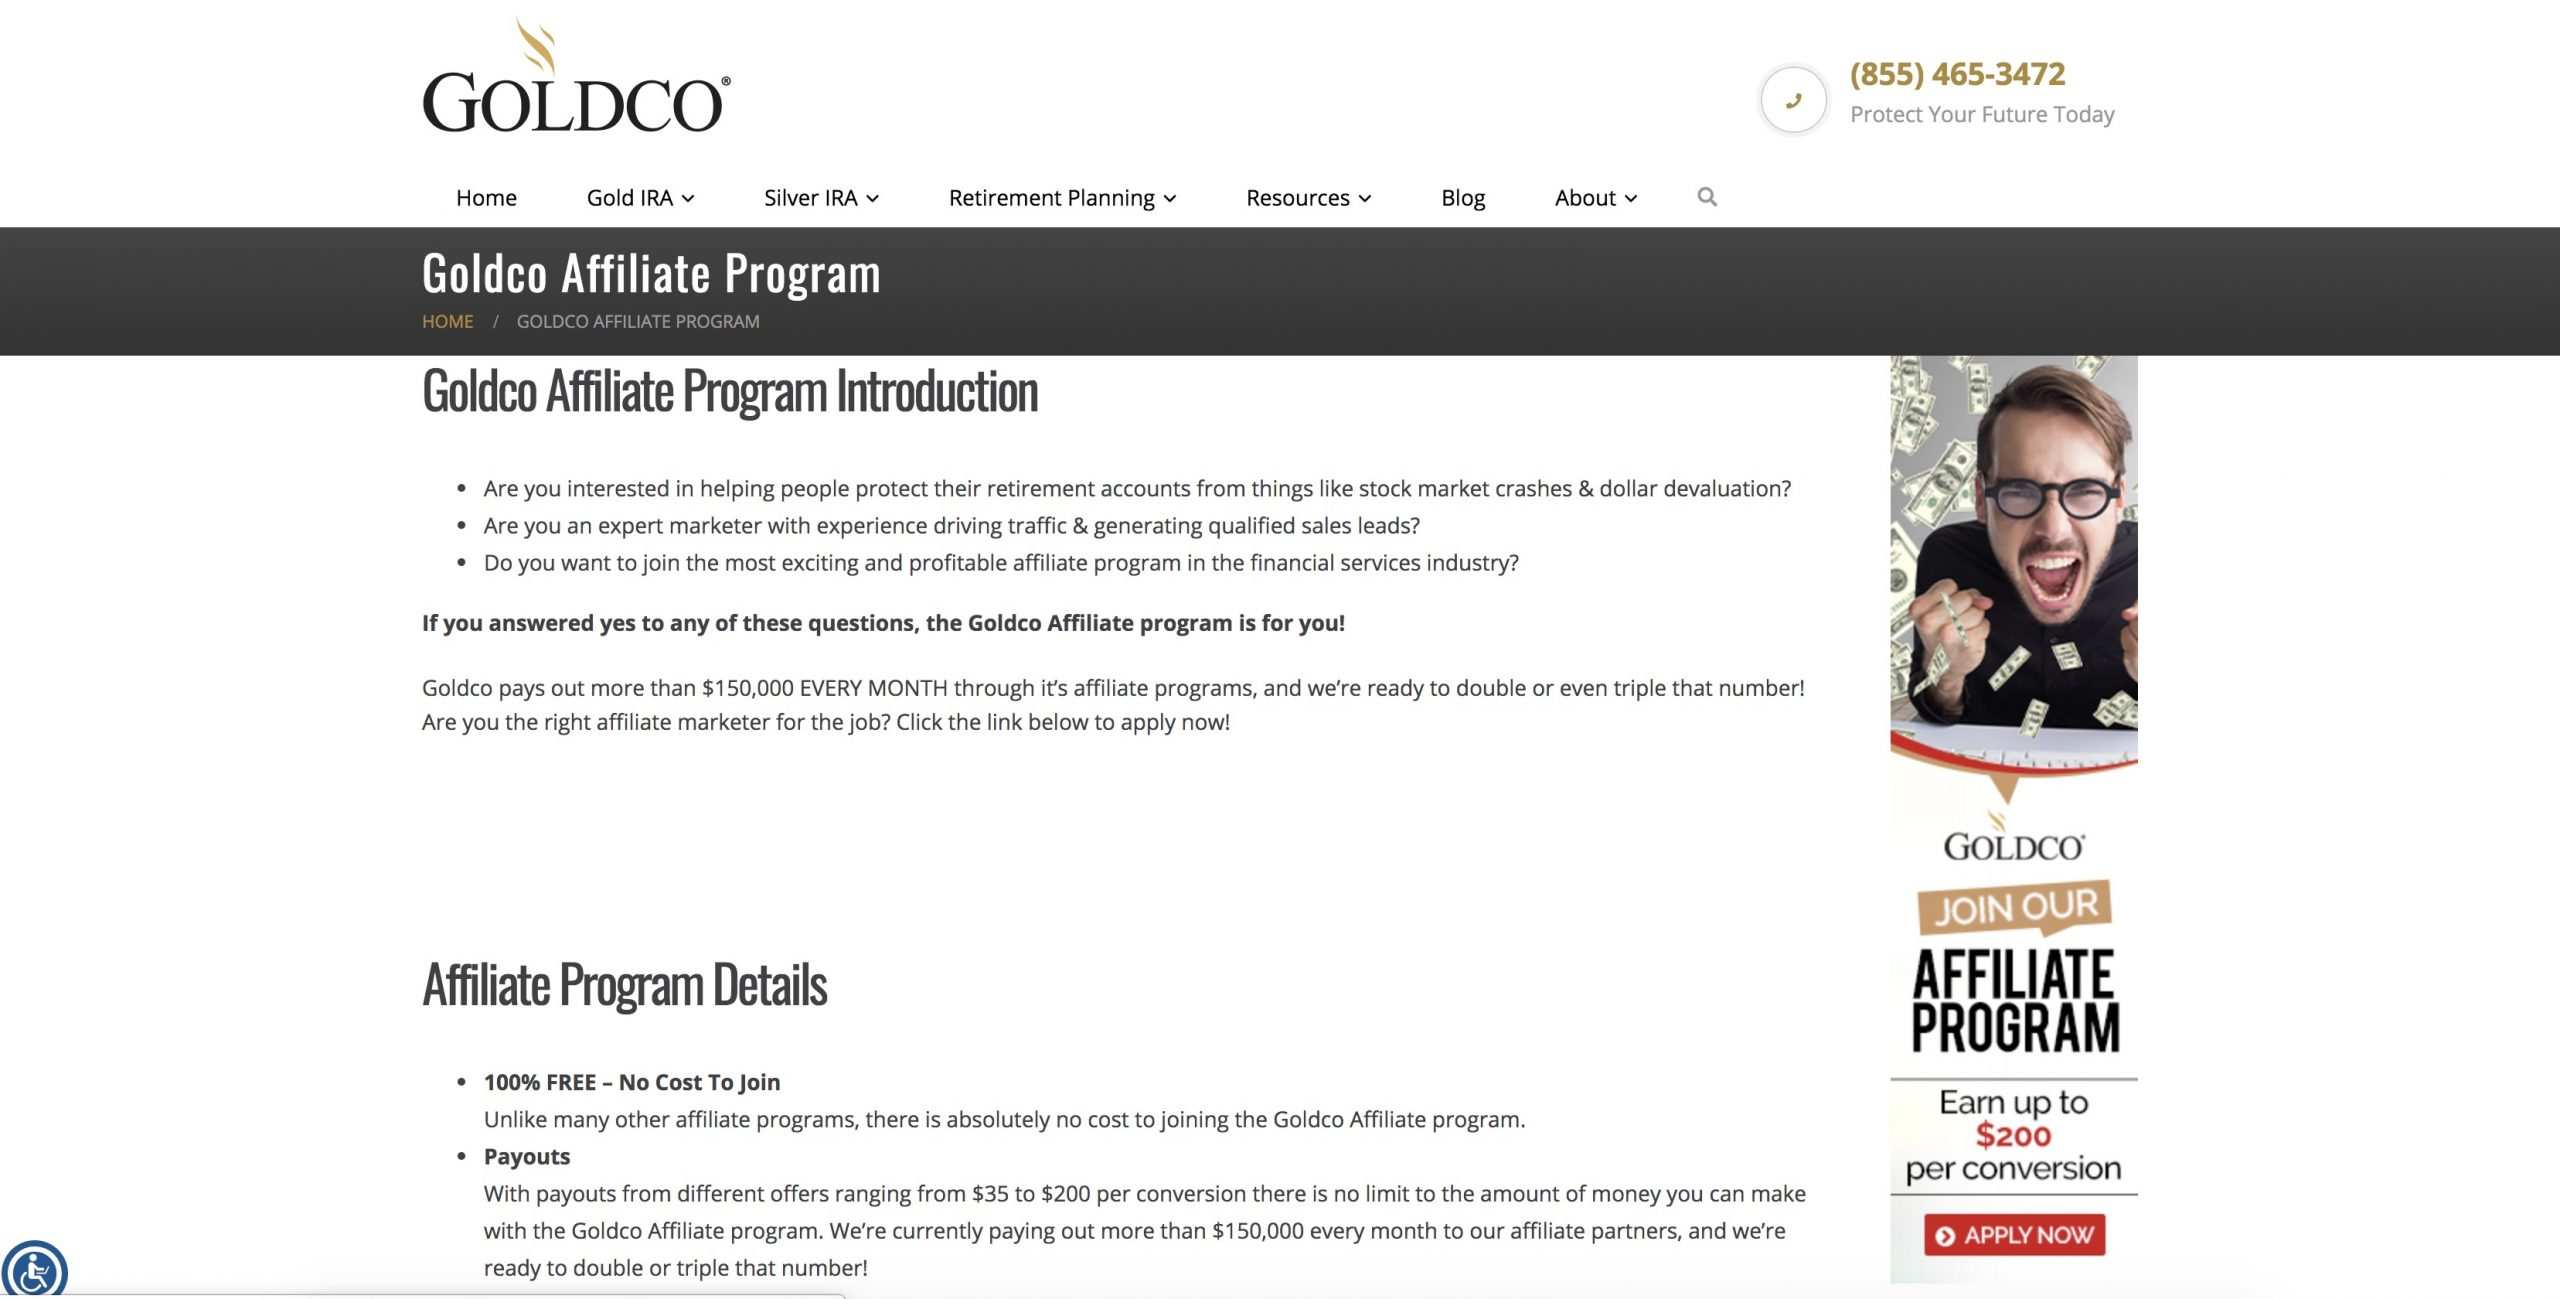 Goldco Affiliate Program